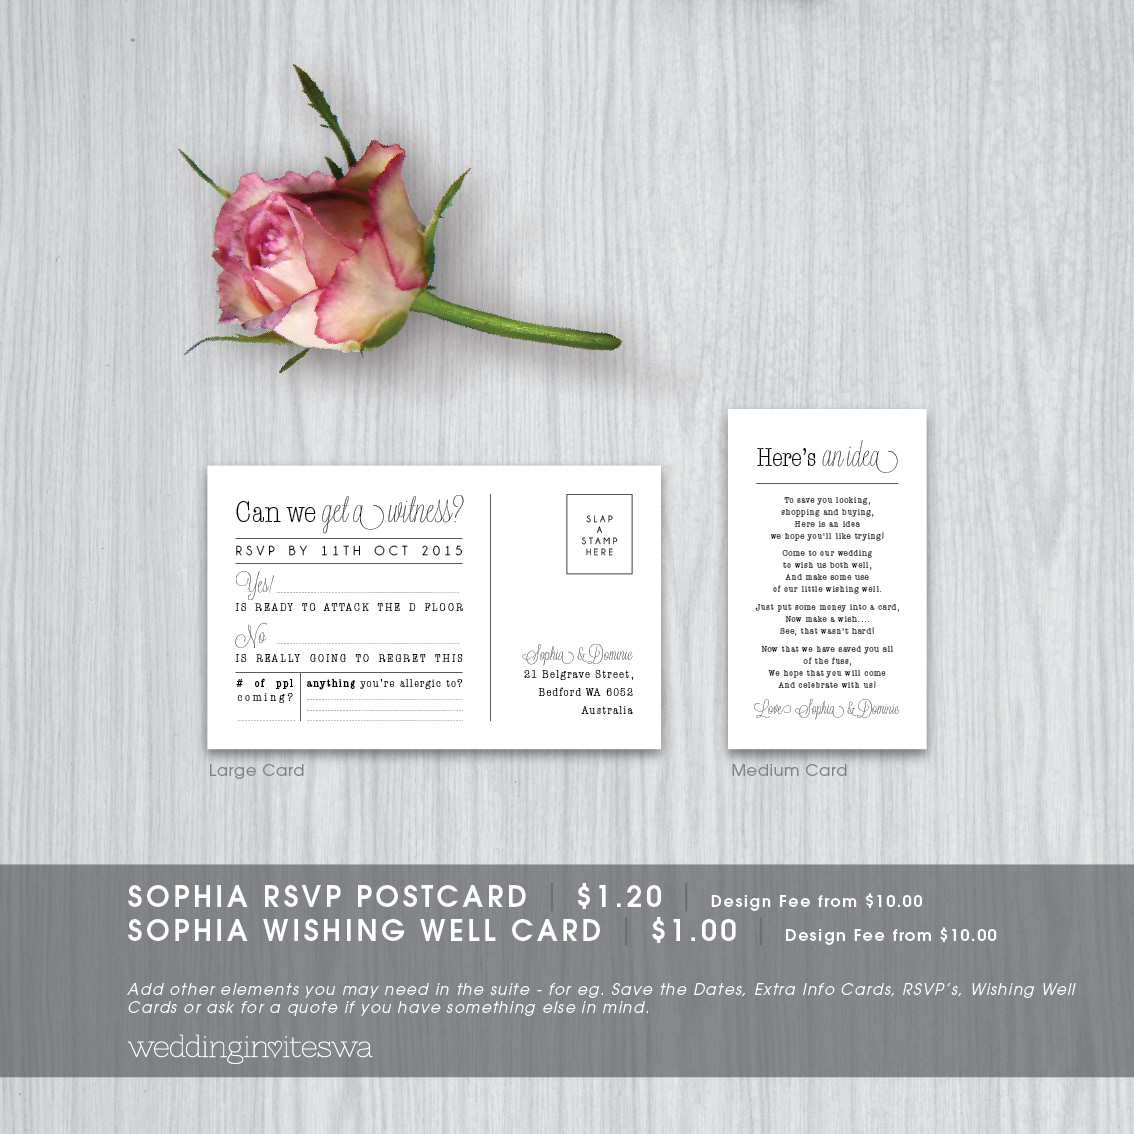 SOPHIA_extra cards